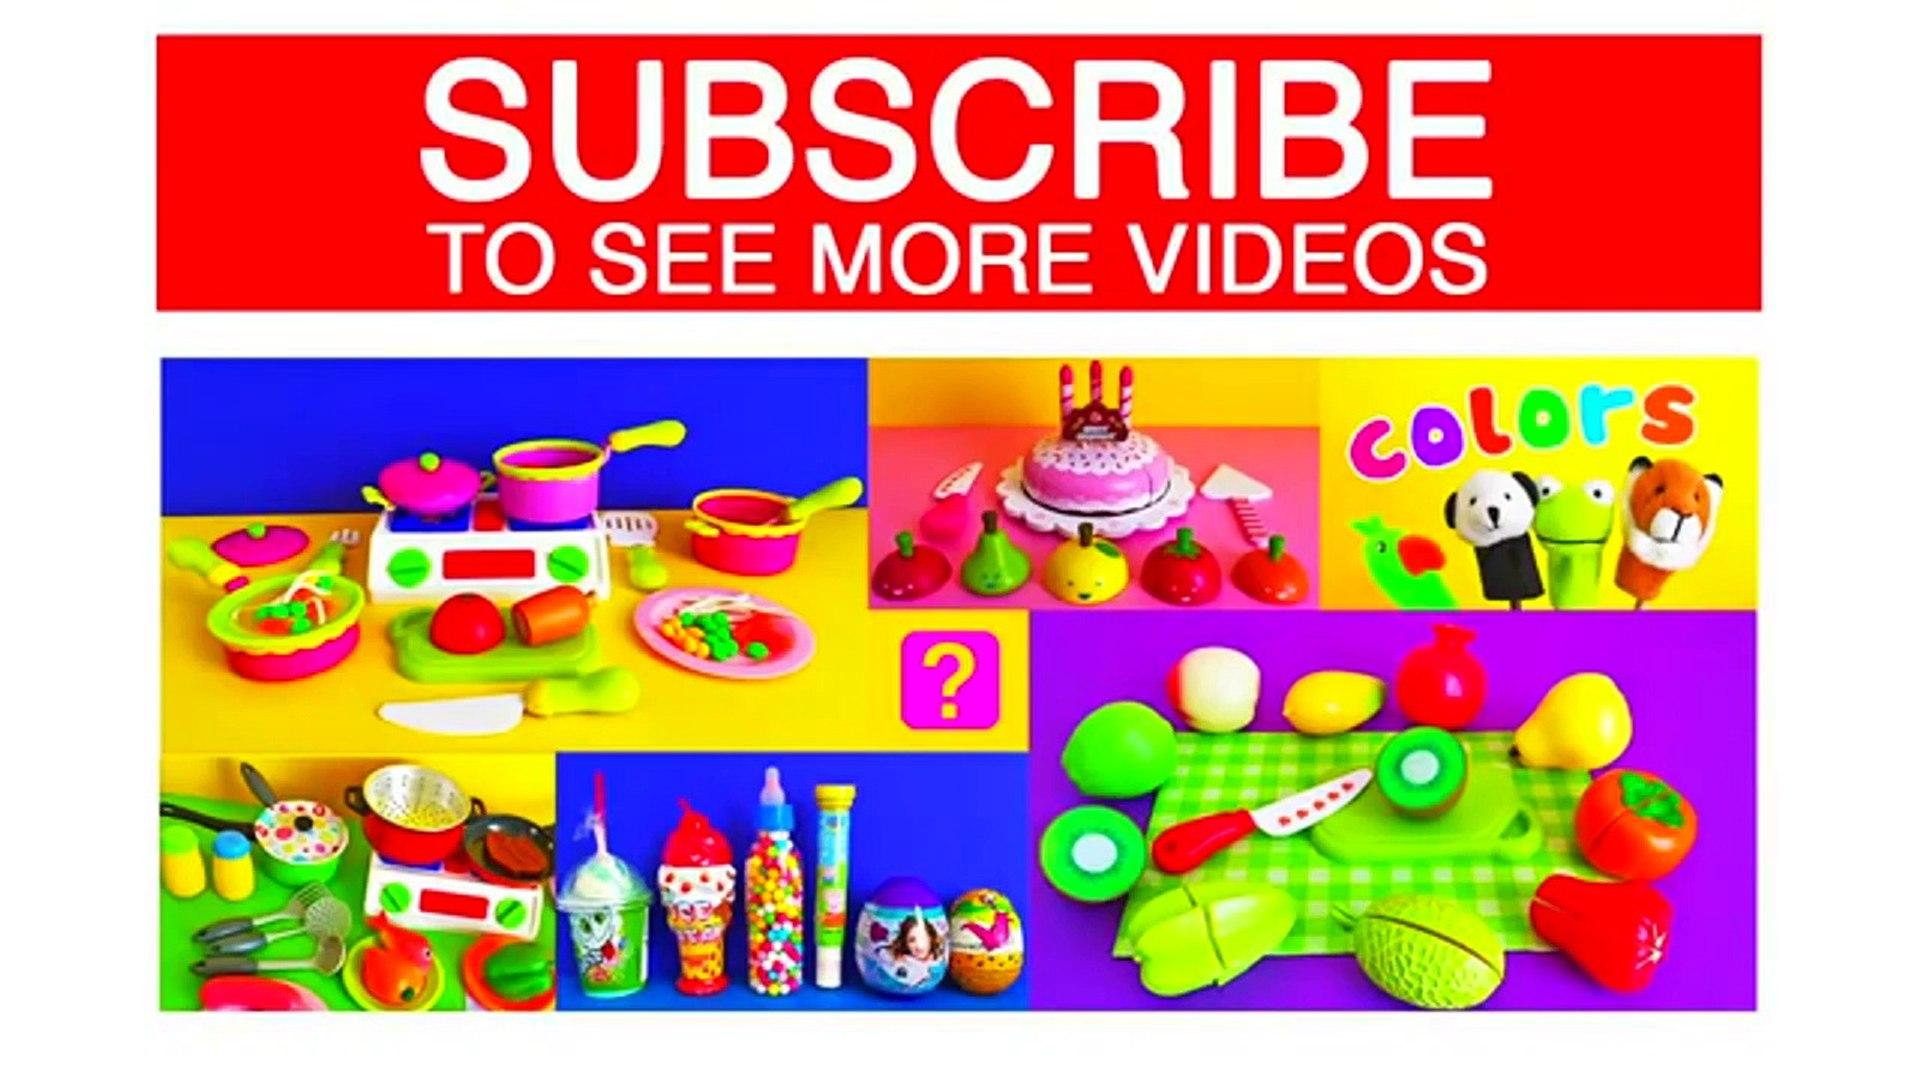 Mainan Mainan Masak Masakan Mainan Blender Mainan Anak Perempuan Terbaru Video Dailymotion